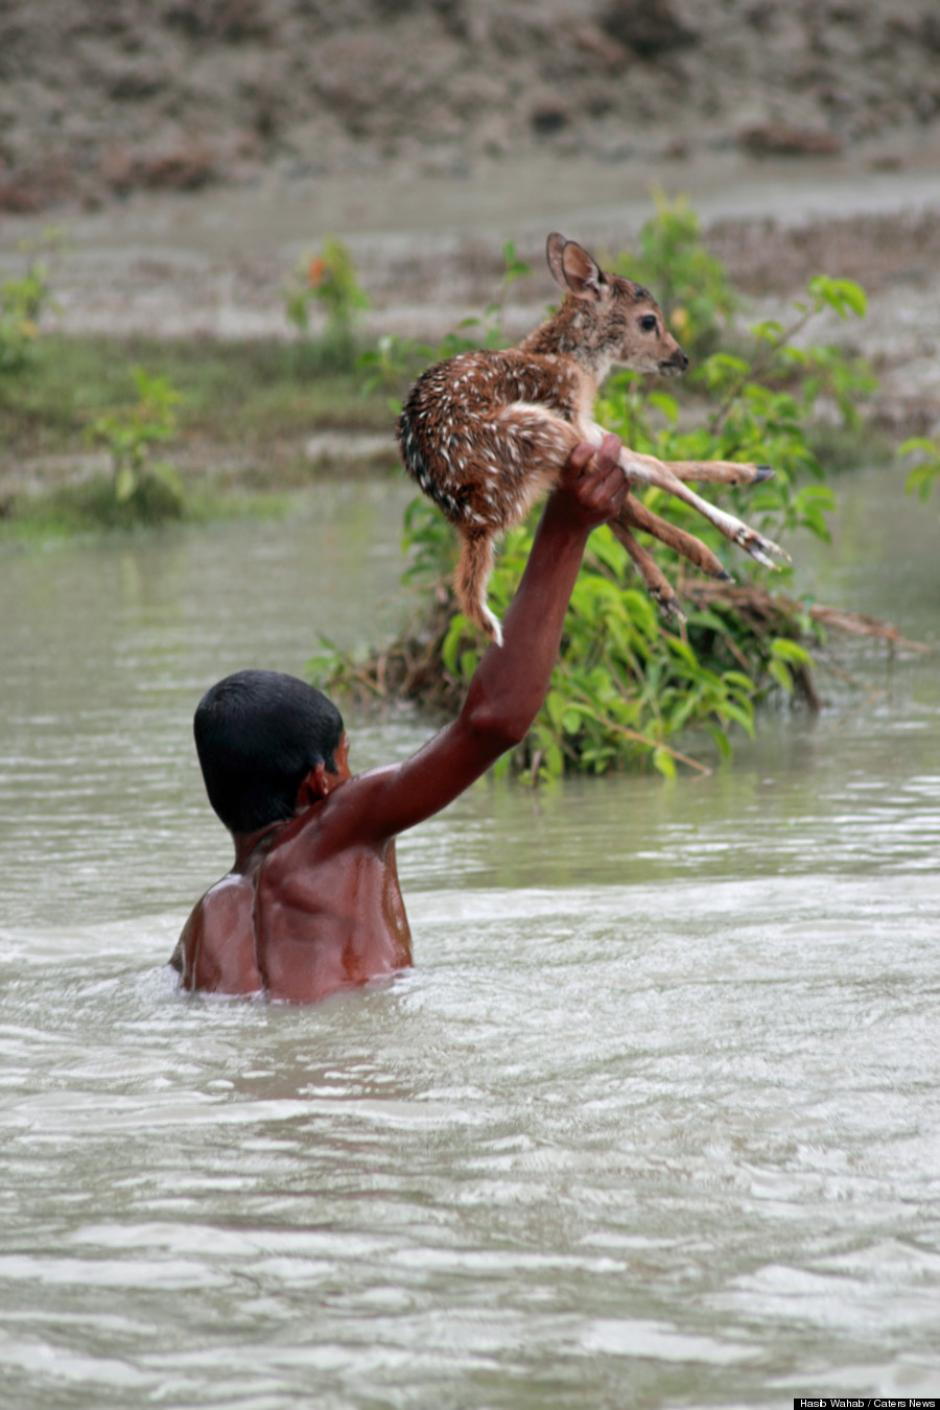 El jóven logró evitar que el venadito se ahogara en el río Noakhali de Bangladesh. (Foto: Huffington Post)